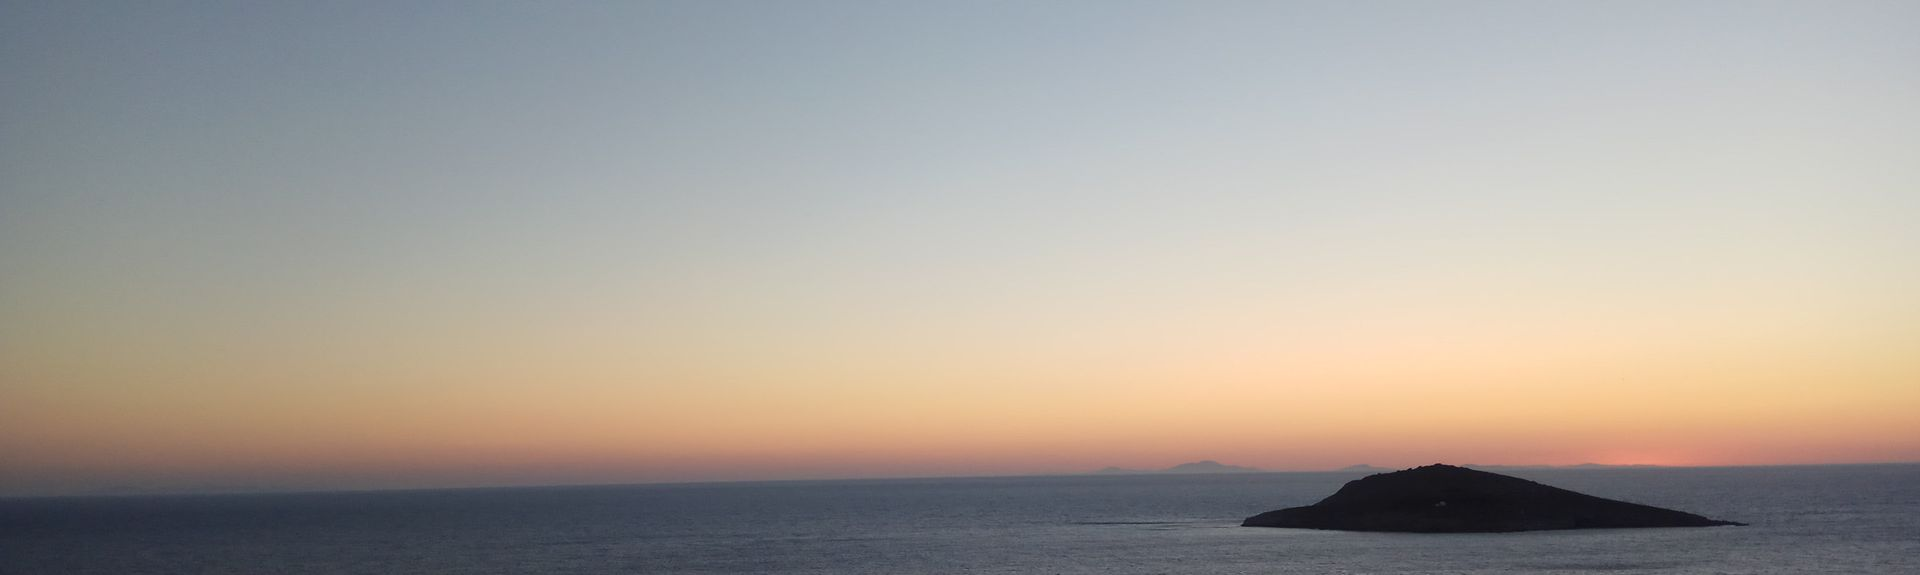 Emporios, Aegean, Griechenland